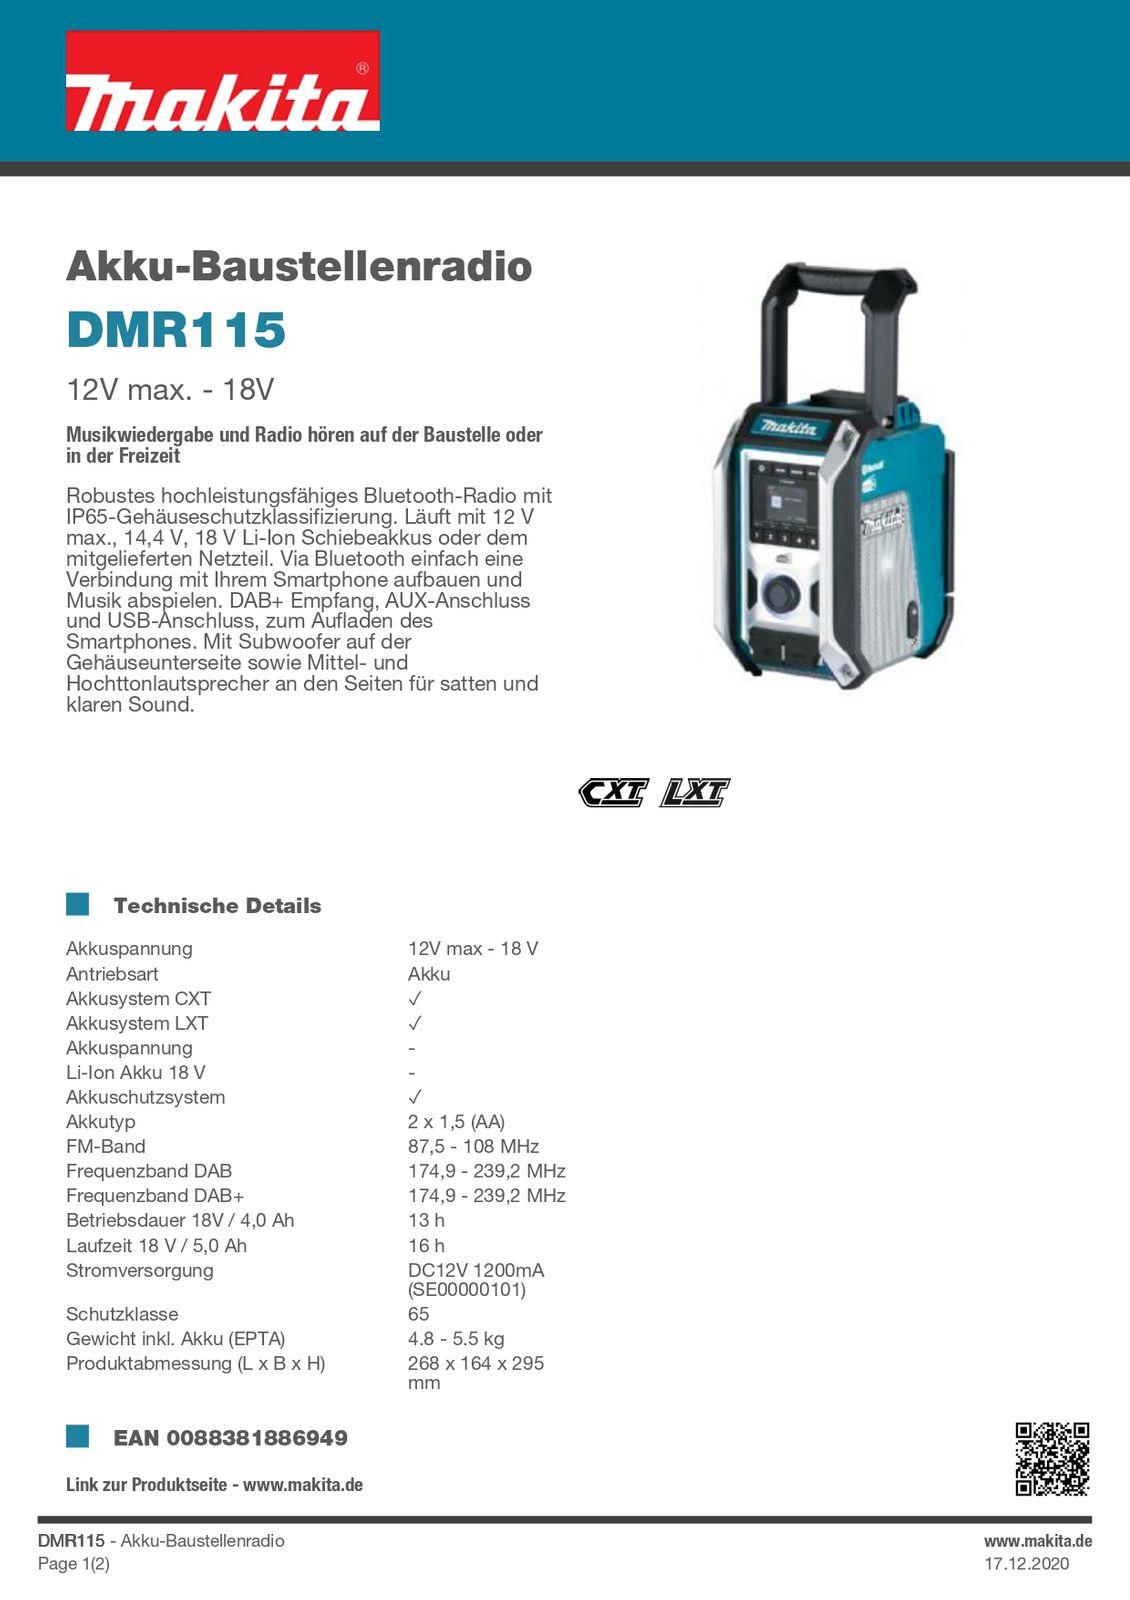 Makita DMR 115 Akku Baustellenradio Akkuradio Radio 16071